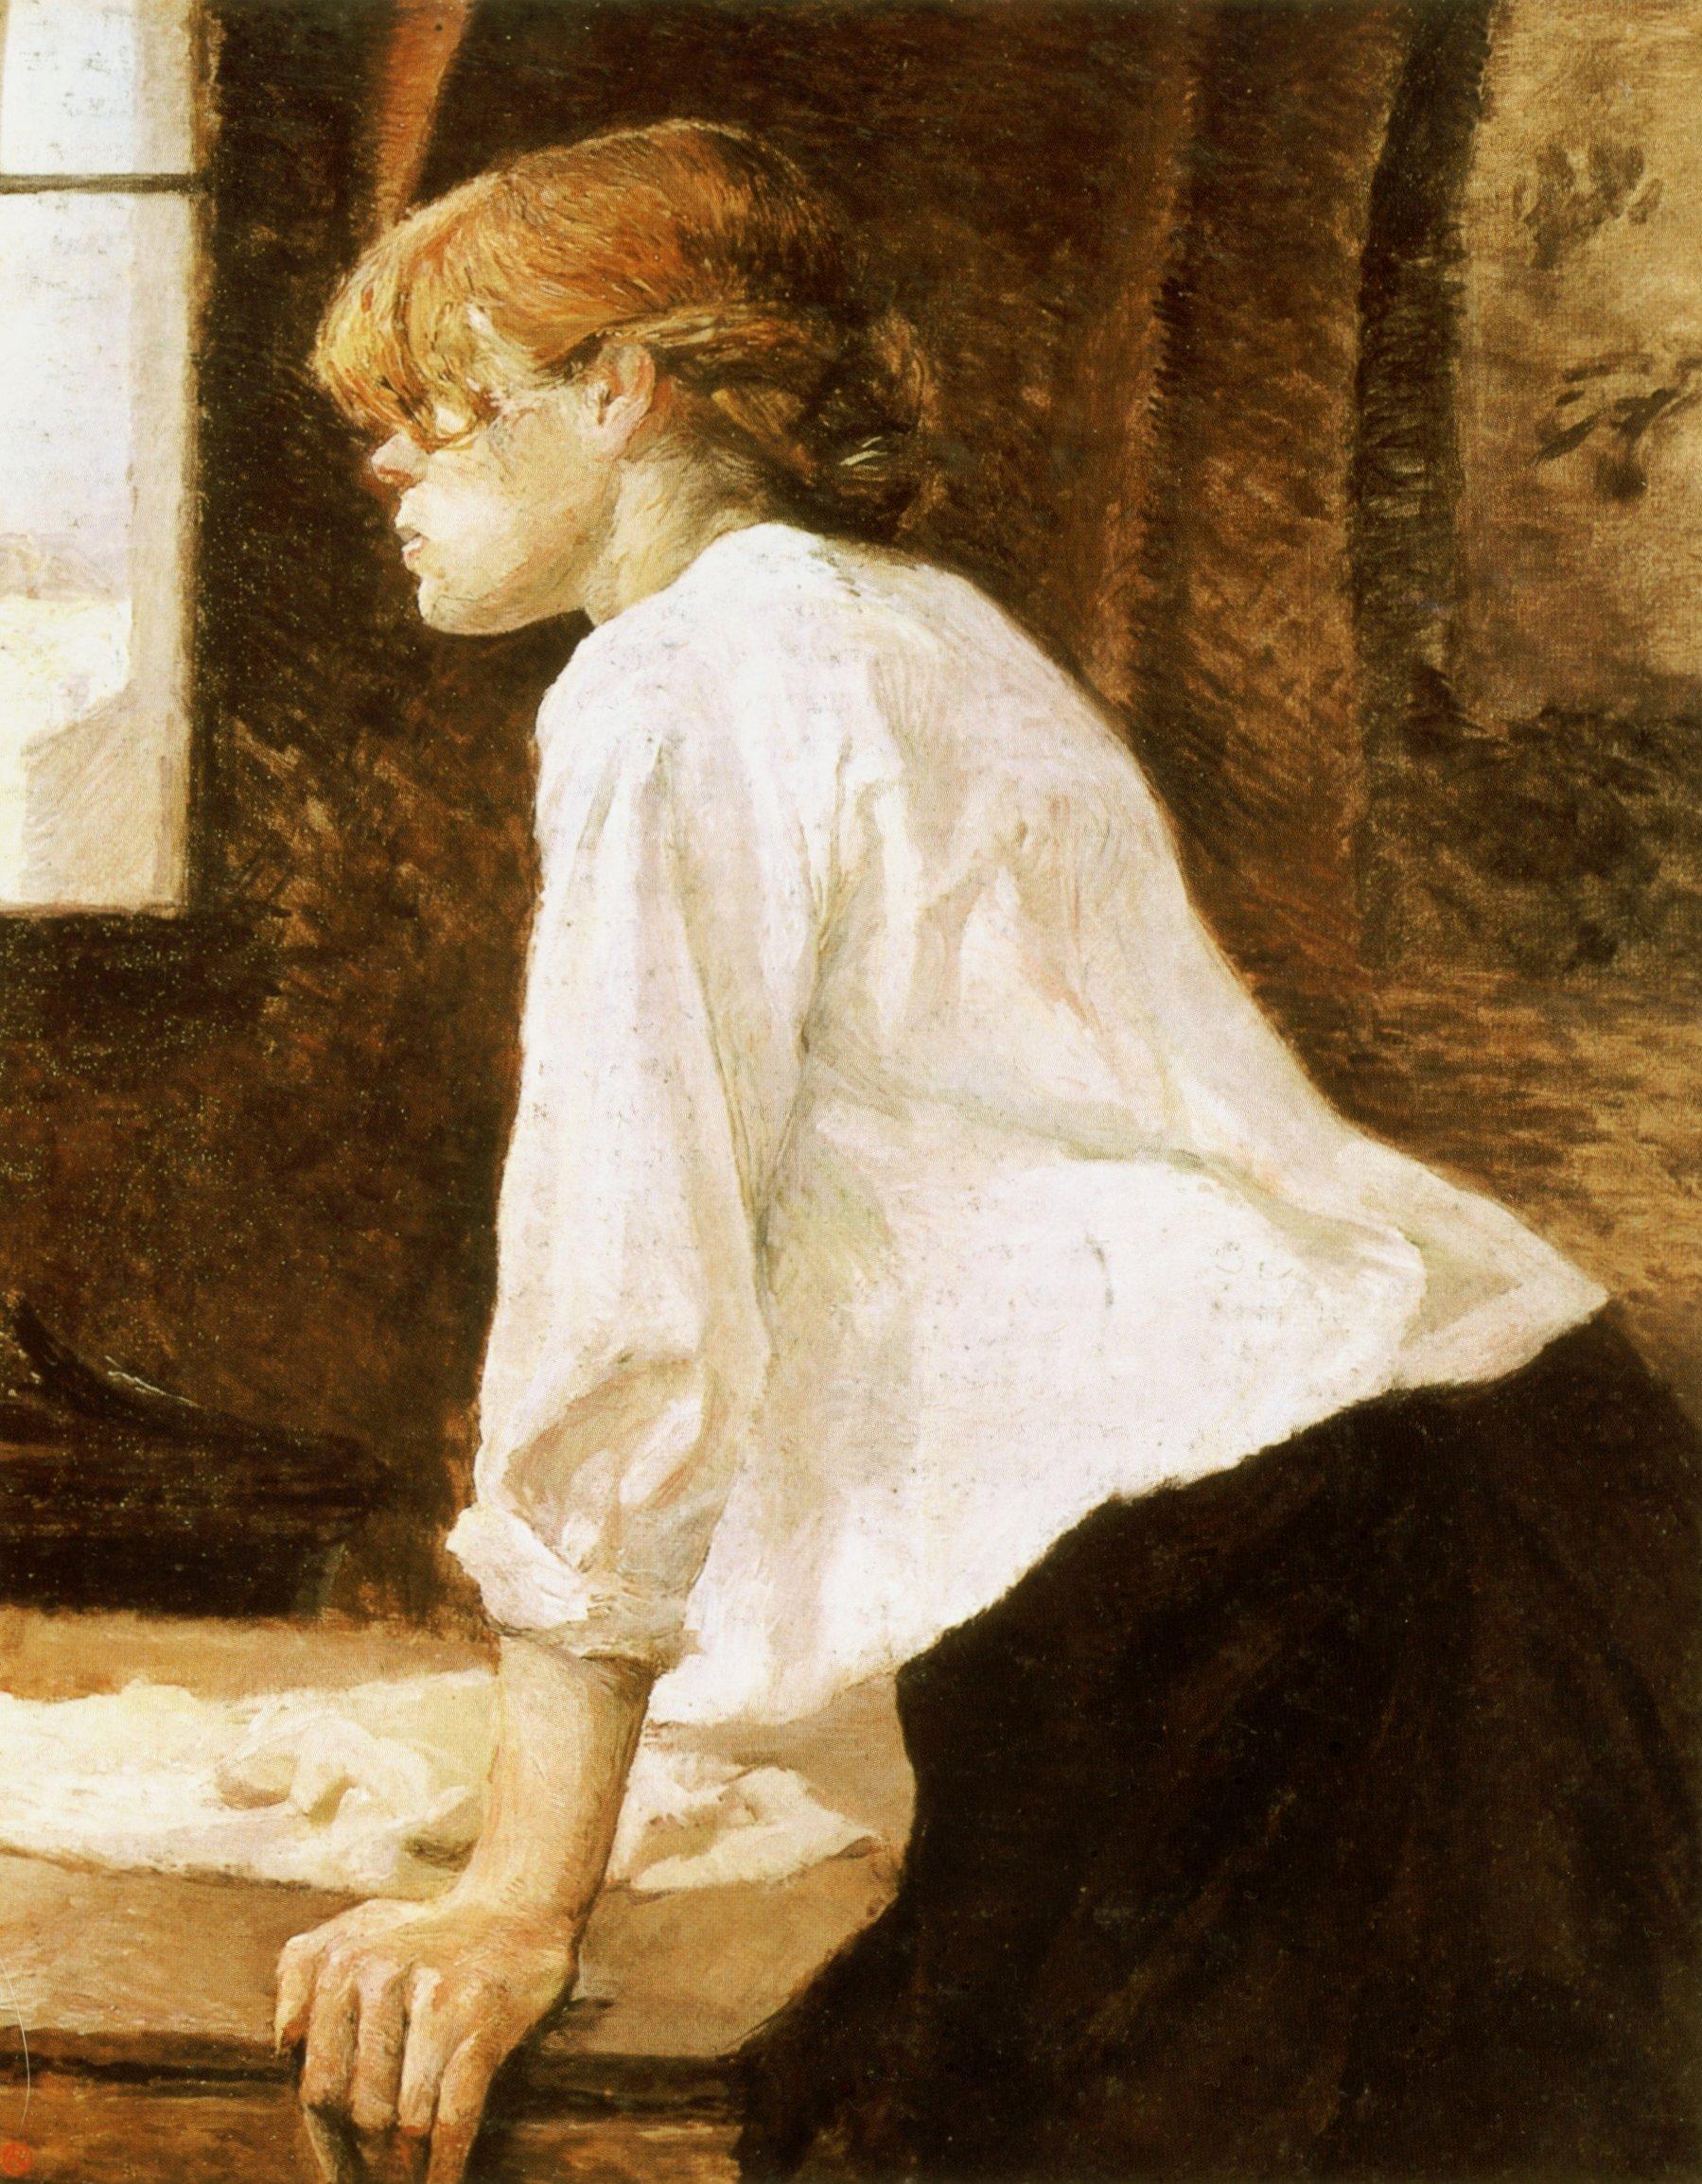 Henri Toulouse-Lautrec: paintings by artist 40